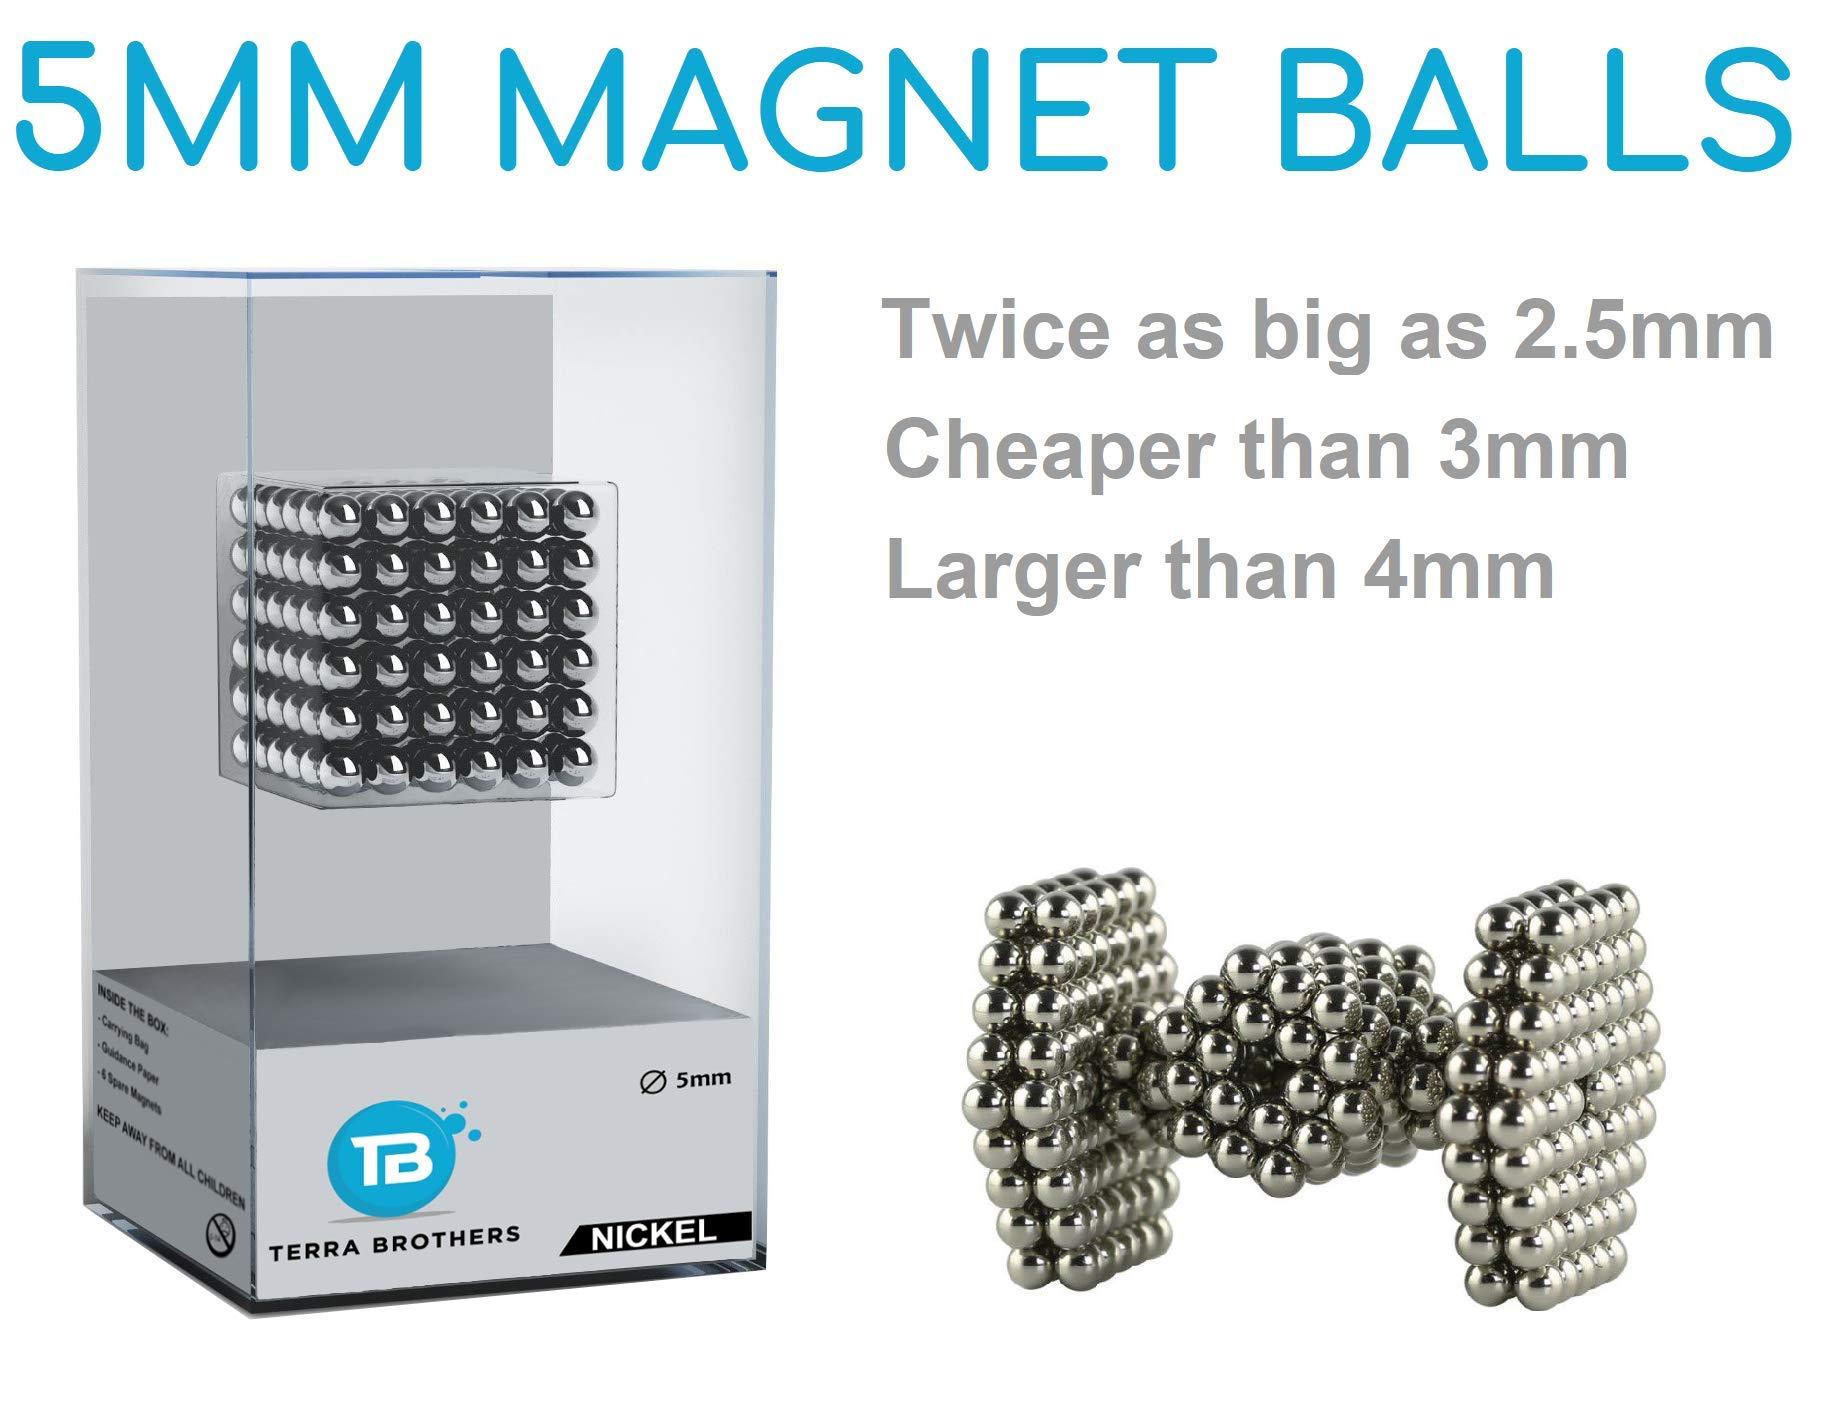 Rankone - Magnetic Balls, Blocks | Stress Relief Desk Toys | Fun Creative Set | Sculpture Desk Toy | Silver Set of 216 Pieces (5mm)